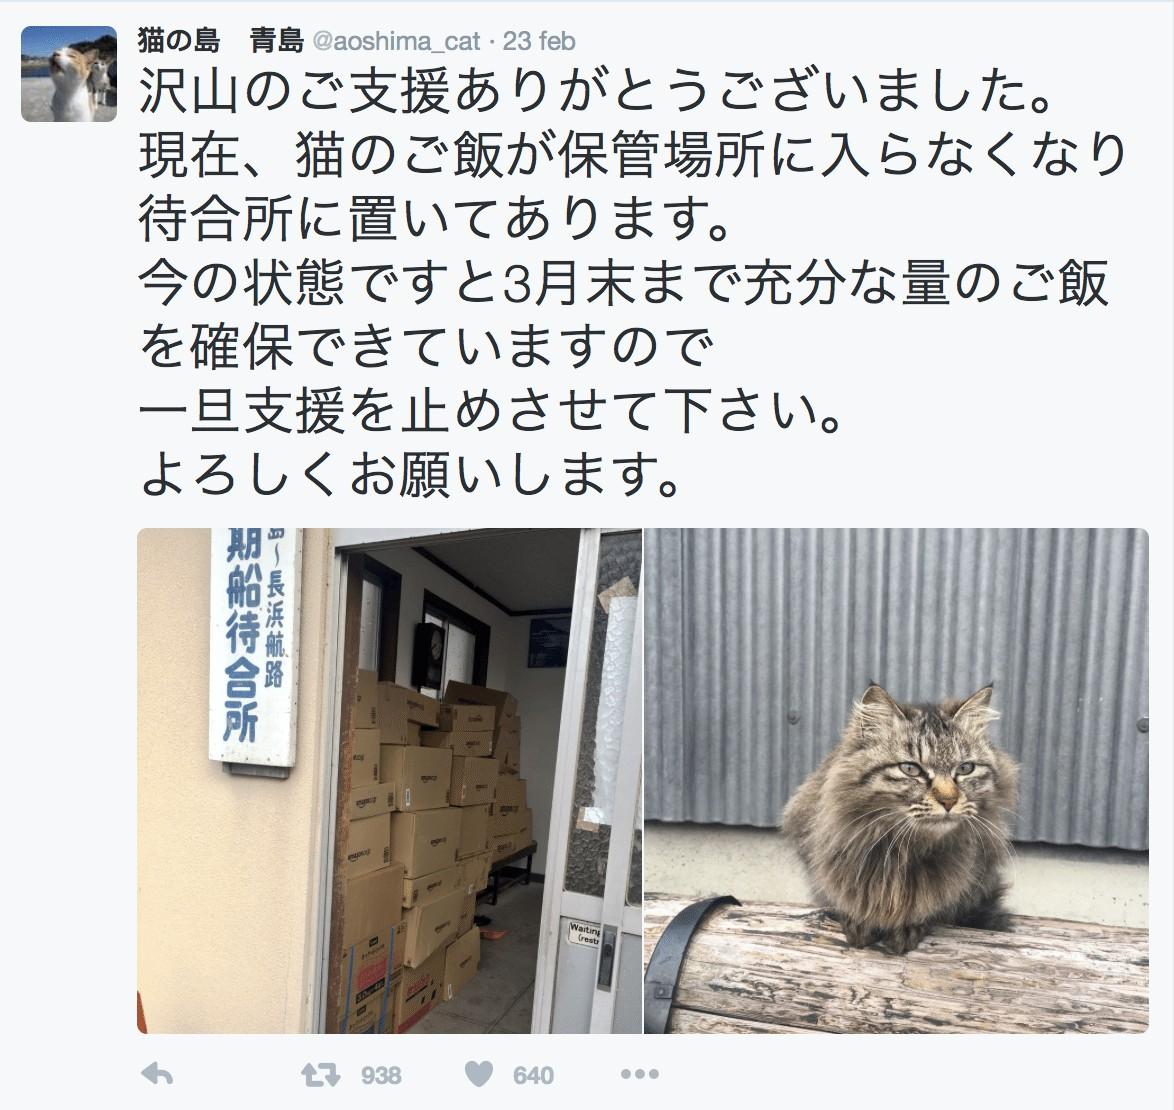 Aoshima riceve pappe dopo un tweet